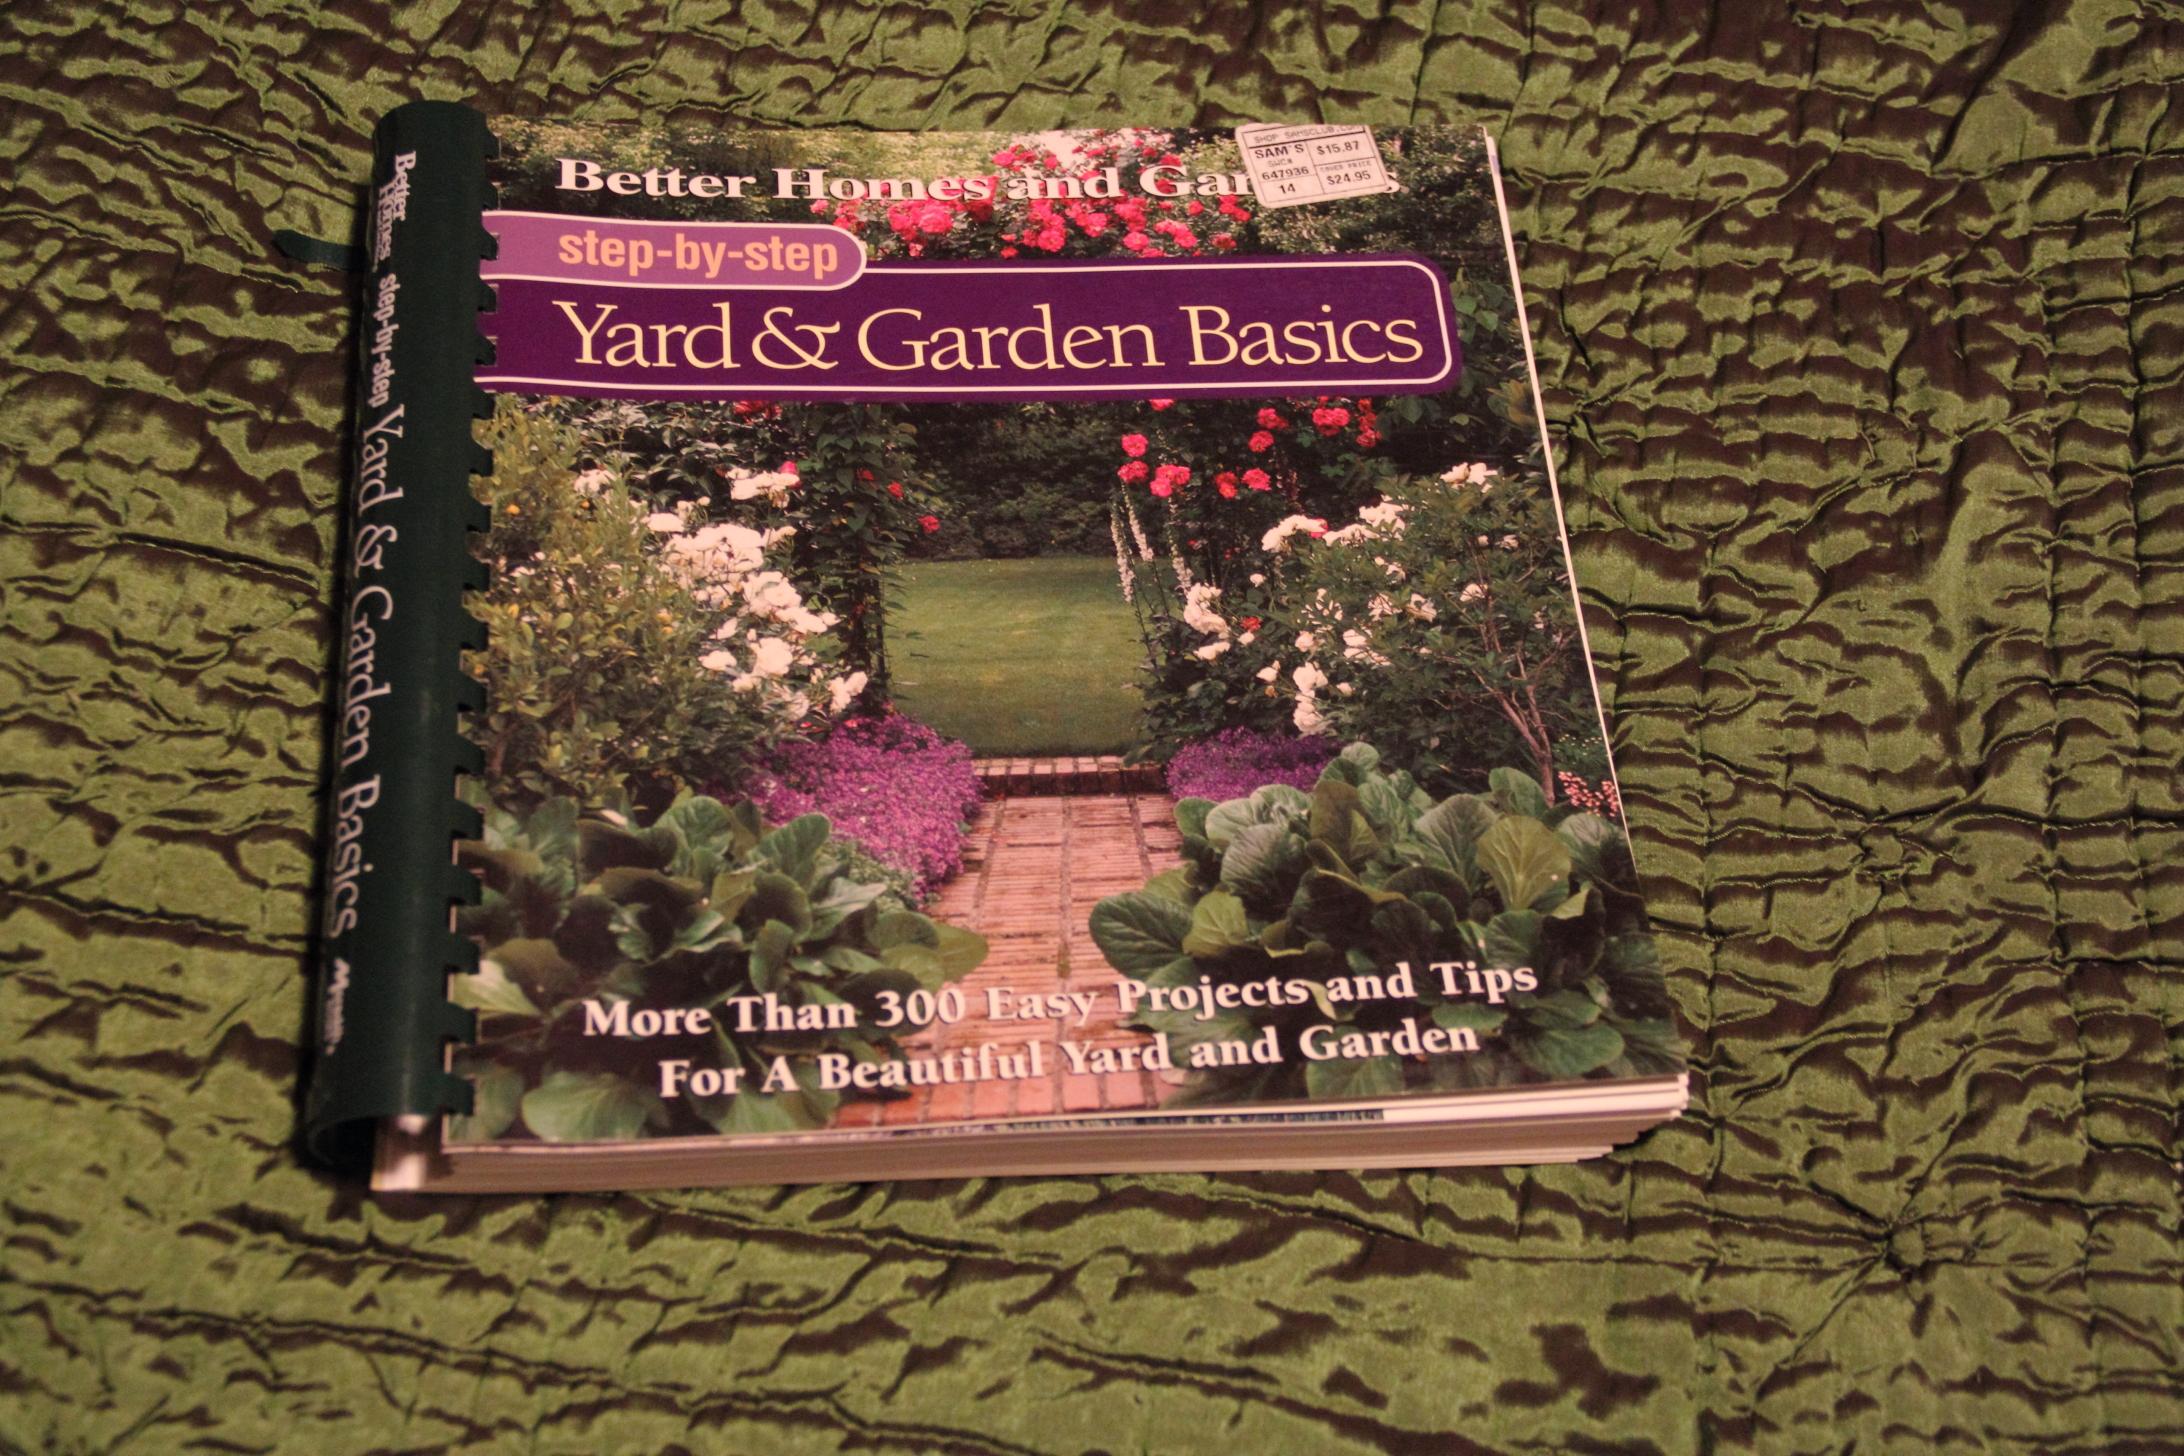 Loanables:Yard & Garden Basics Book located in Traverse City, MI